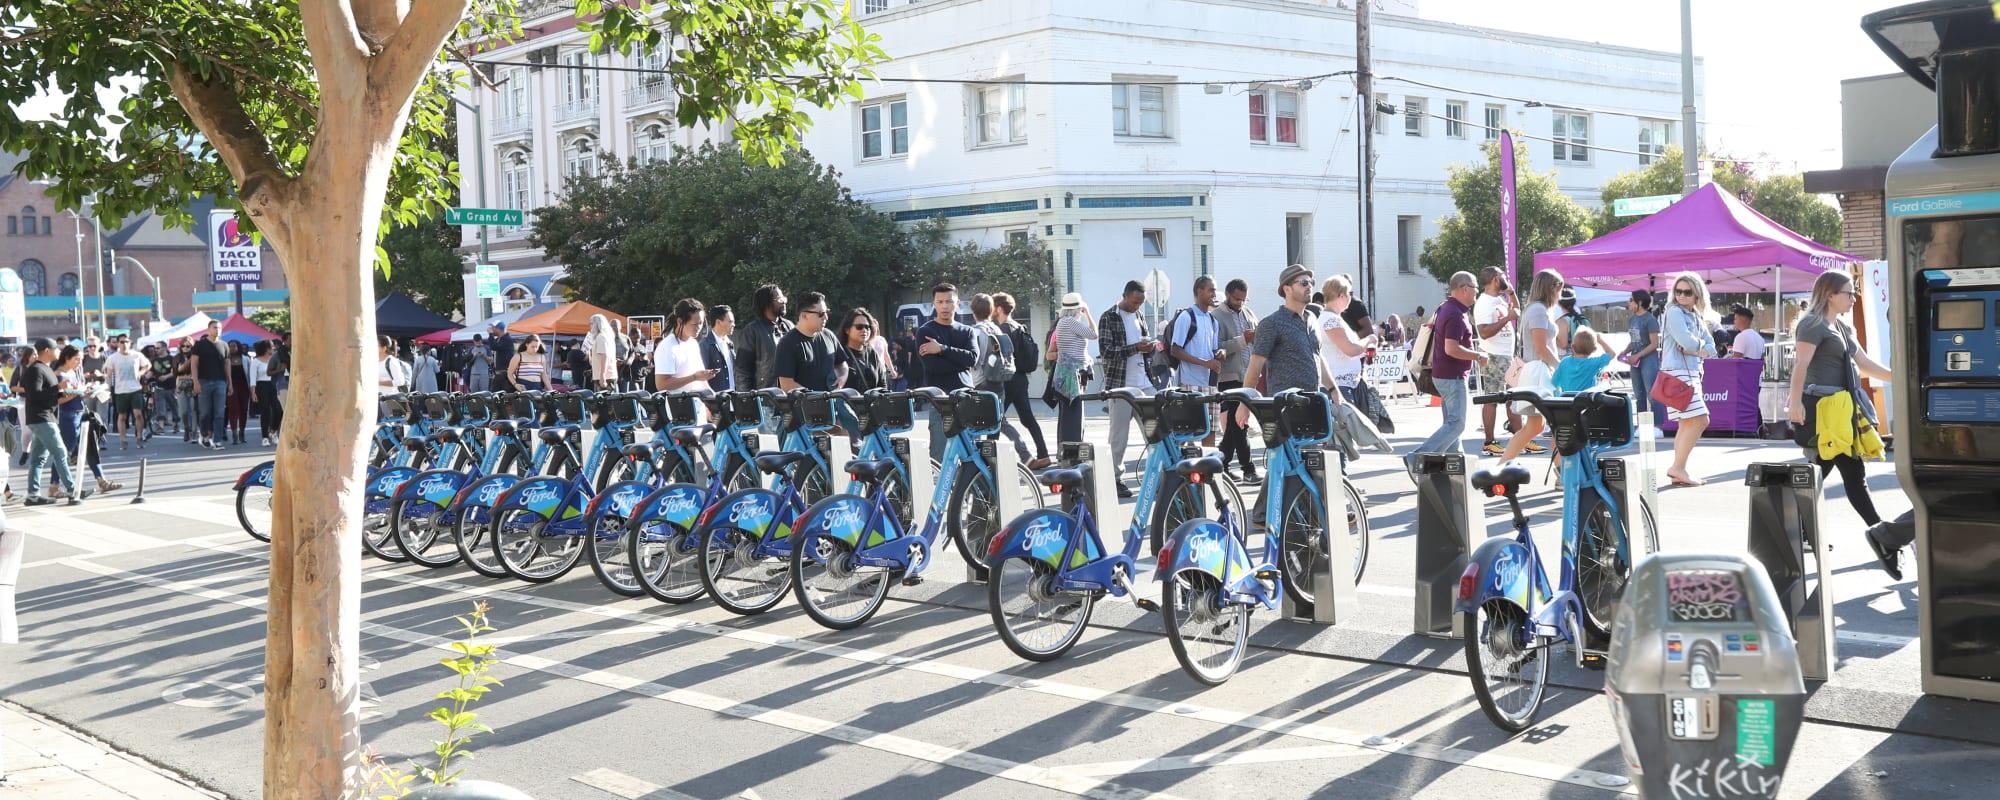 Line of rentable bikes near The Moran in Oakland, California